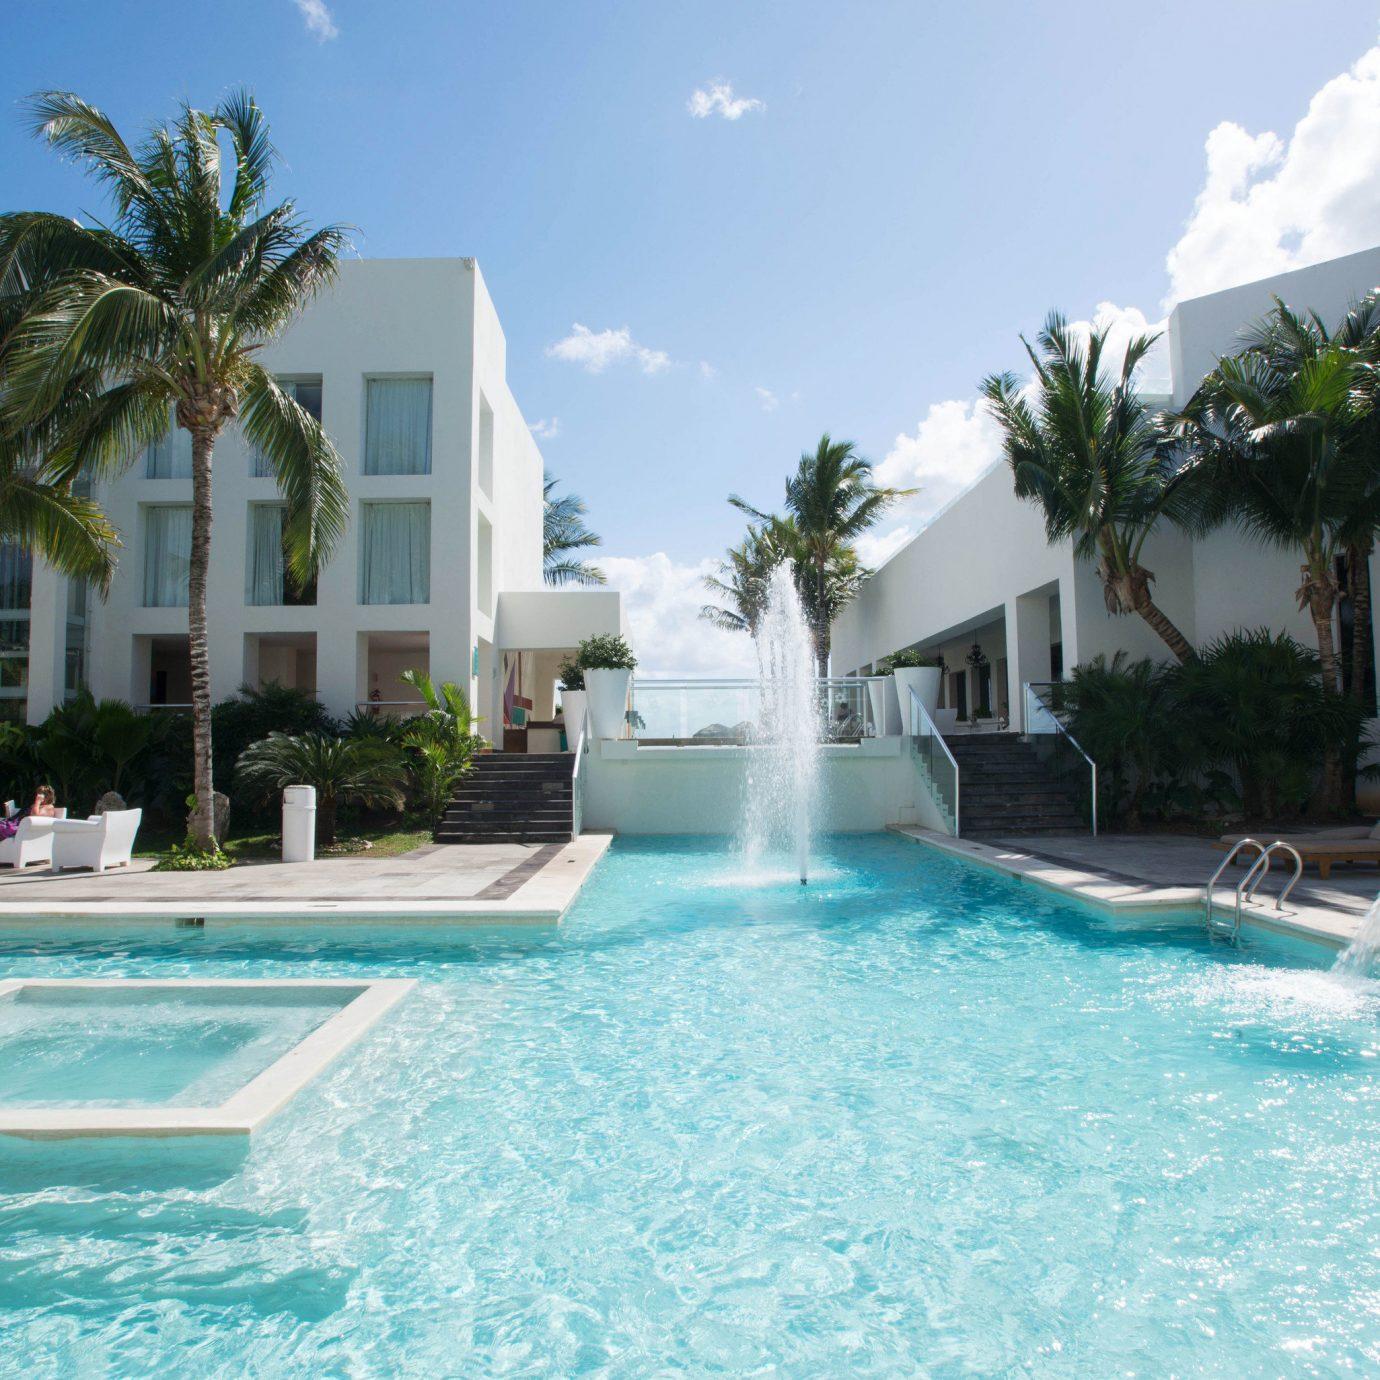 tree sky Pool water swimming pool property Resort leisure condominium caribbean Villa water sport resort town swimming mansion blue